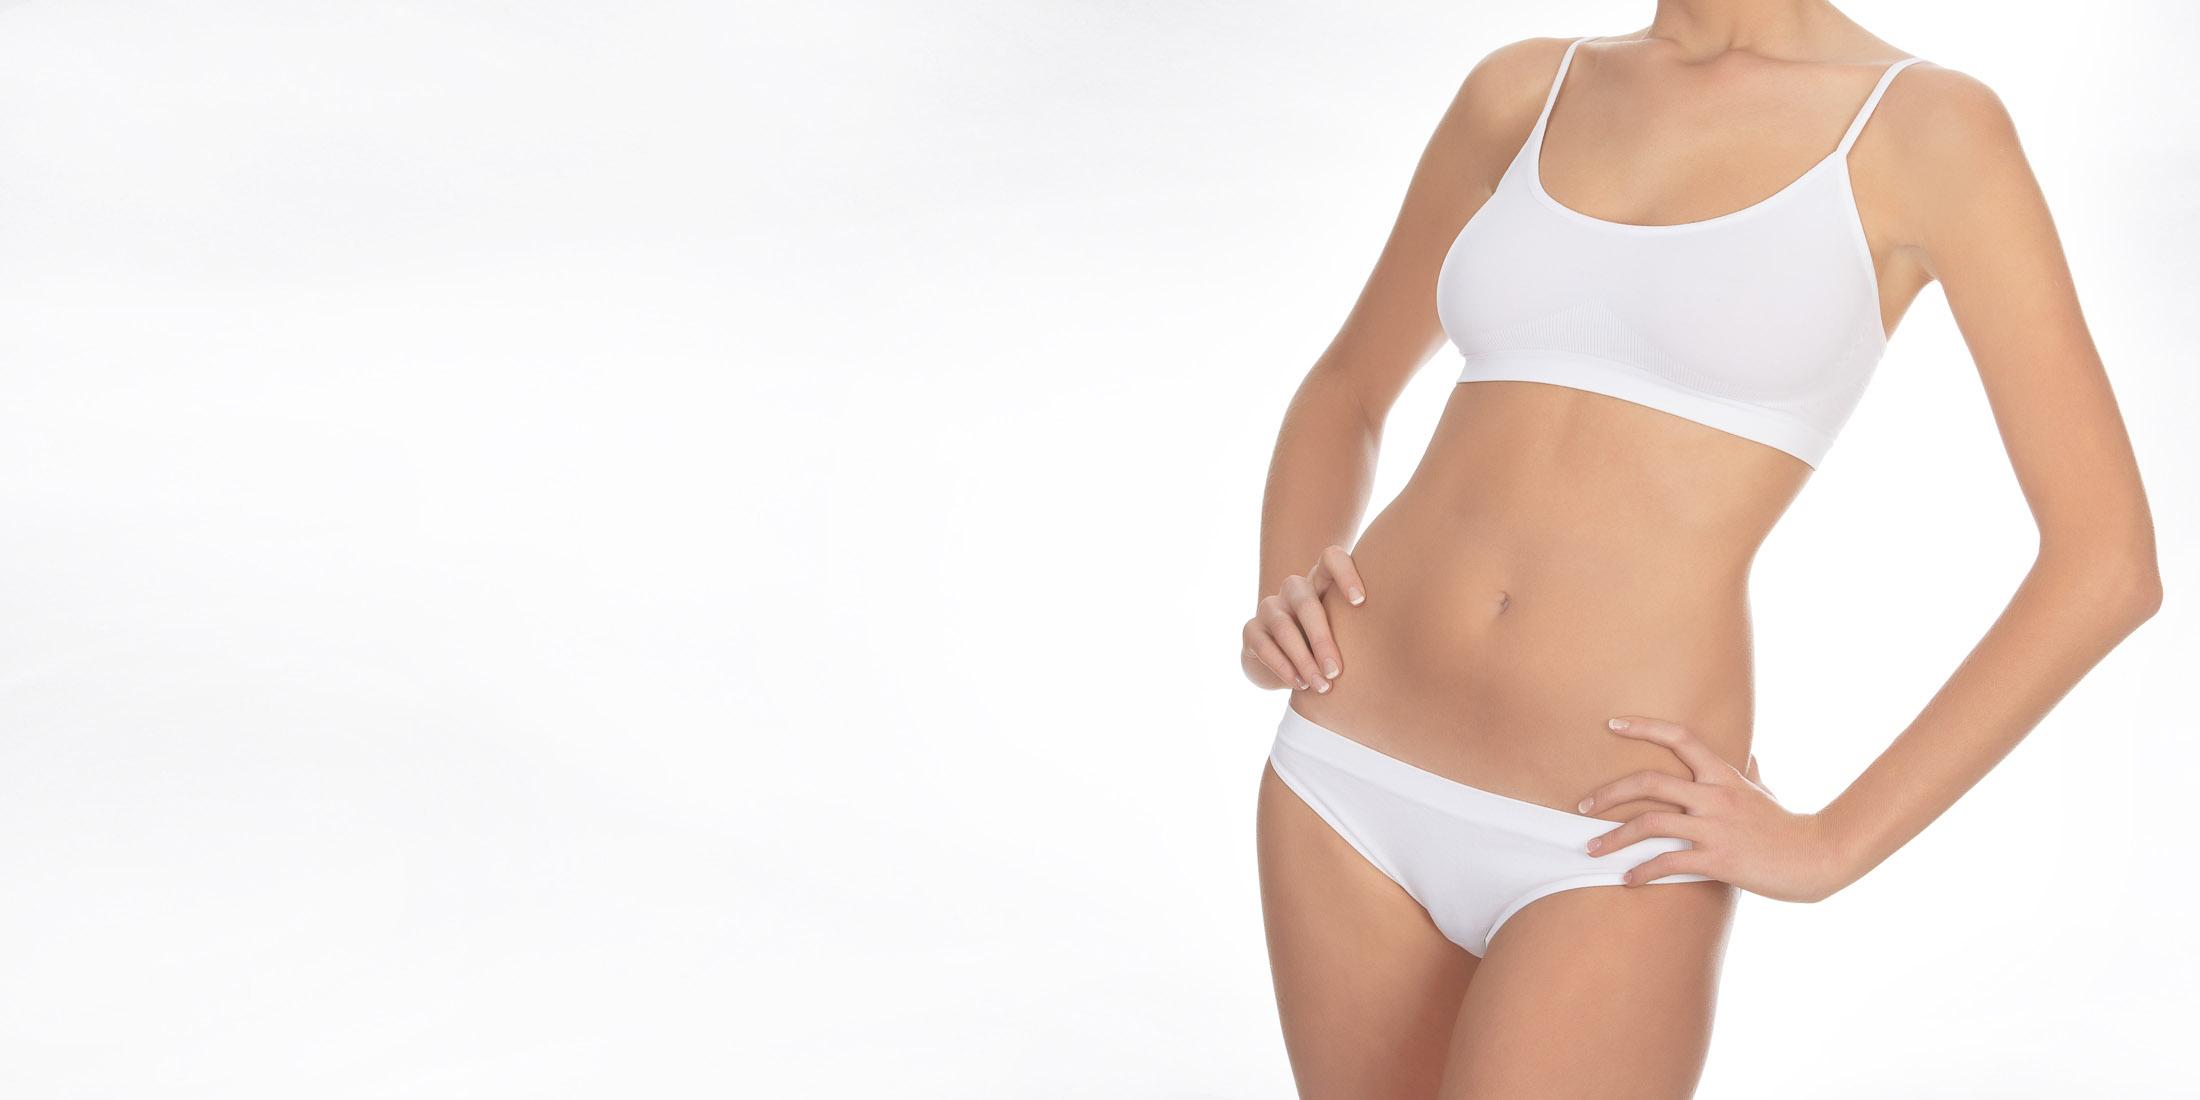 body fat removal